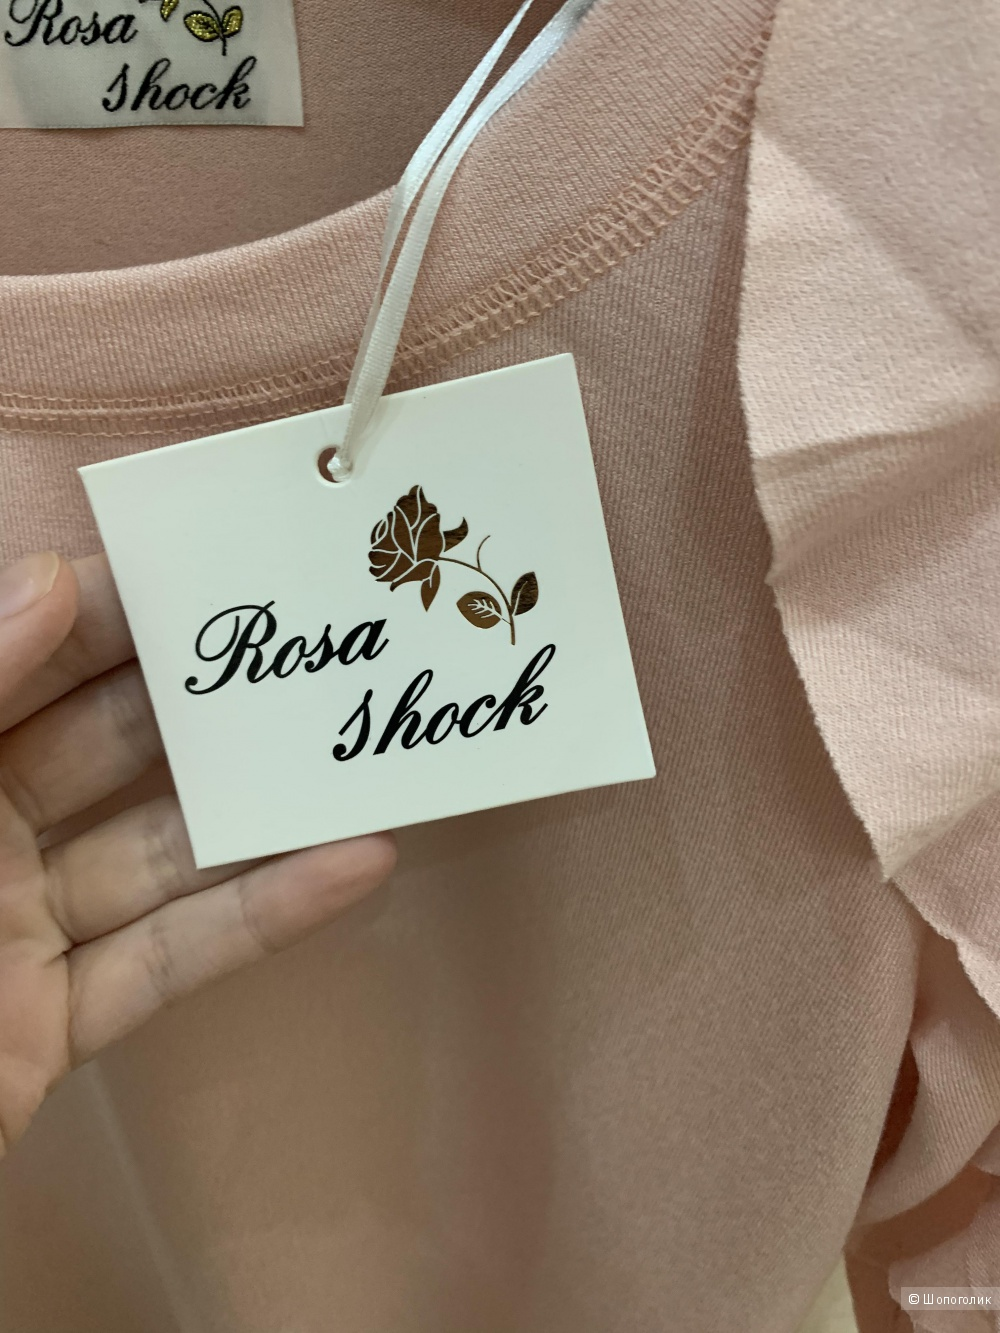 Кофта Rosa Shock, размер s (подойдёт на 42-44)